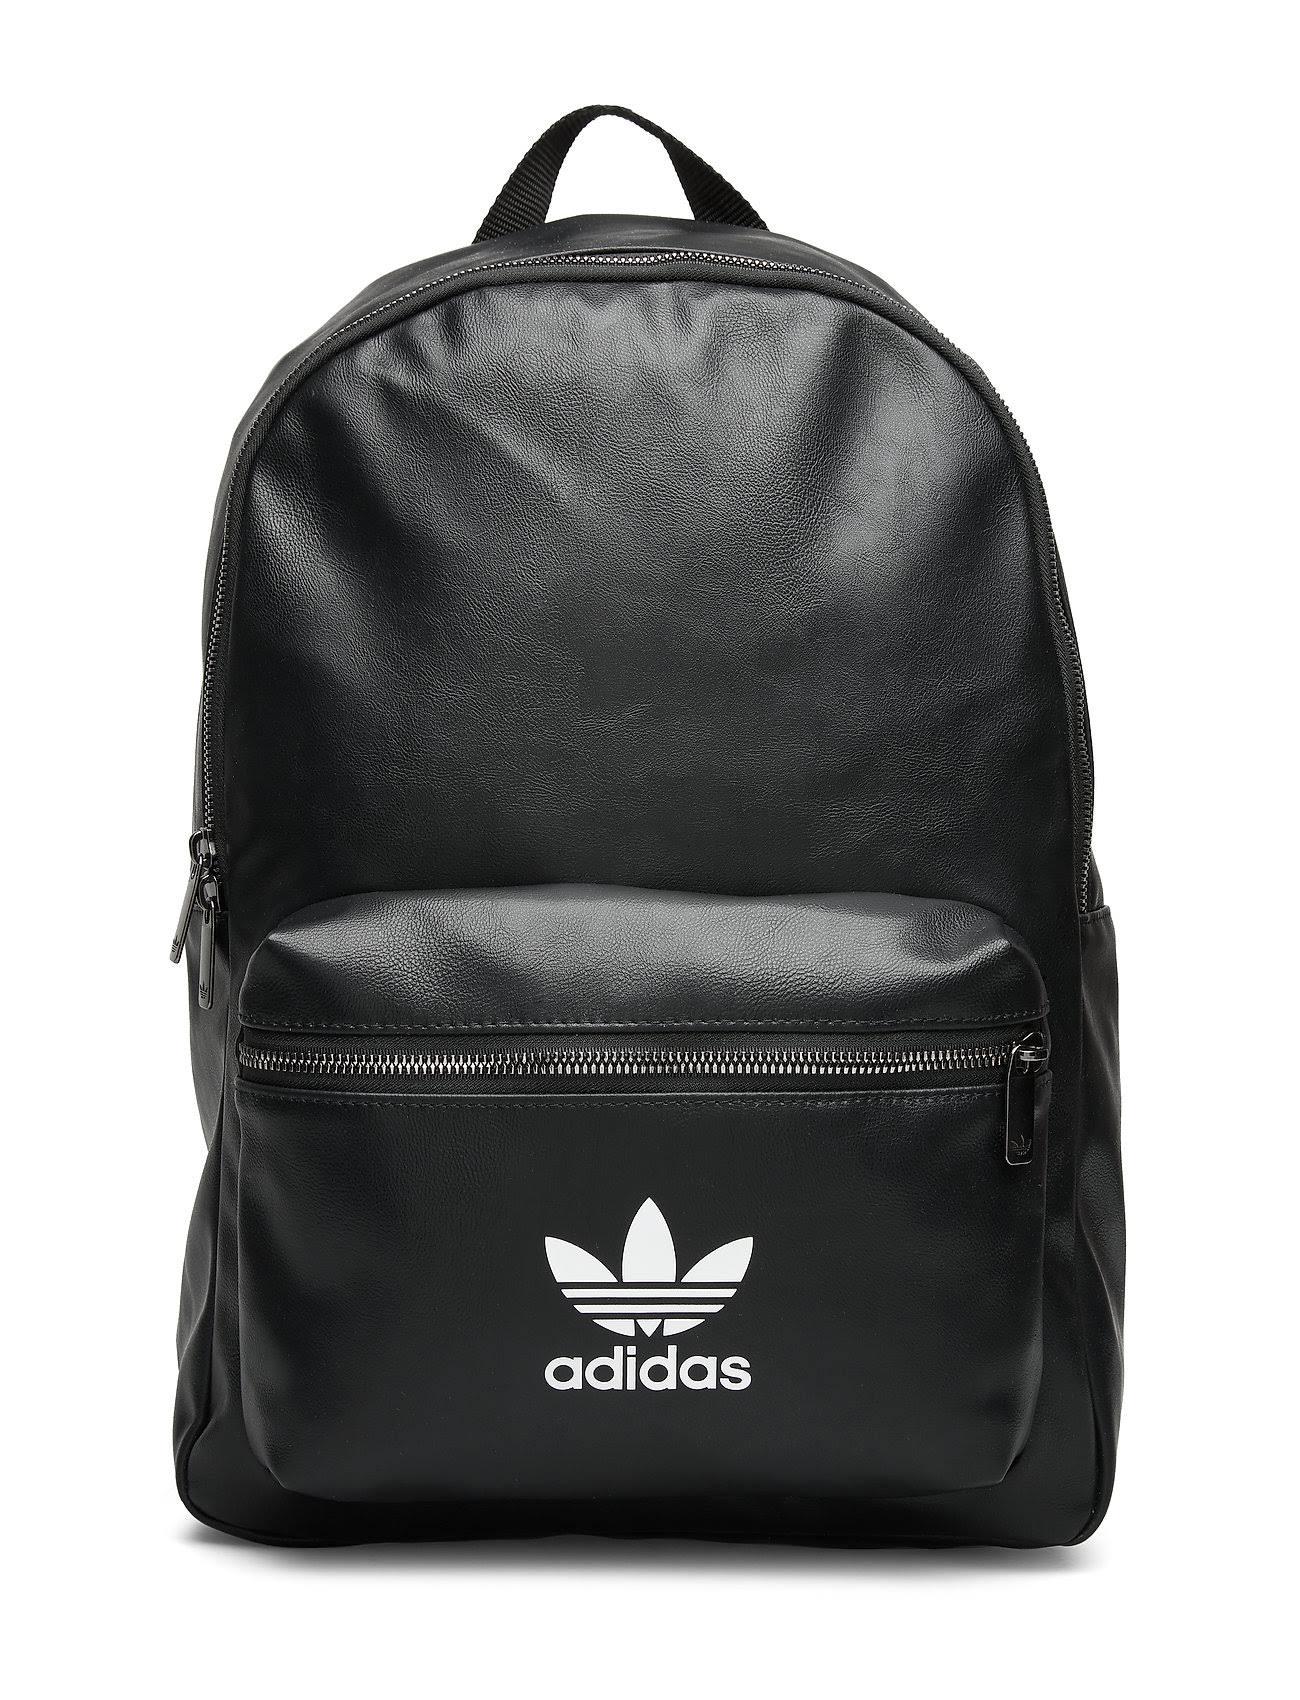 Adidas Classic Backpack - Black - Women